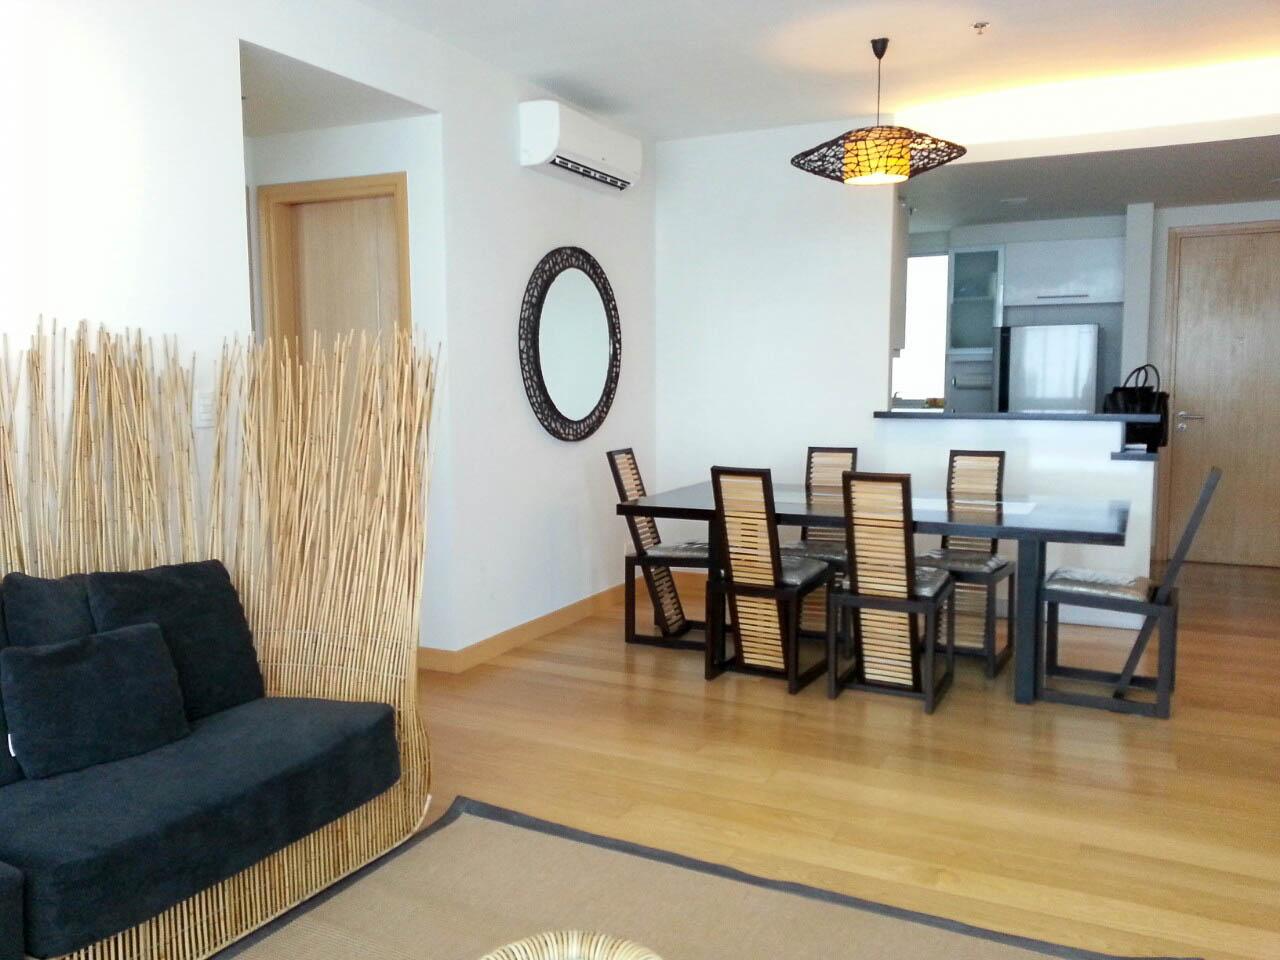 2 Bedroom Condo for Rent in Cebu Business Park 1016 Residences